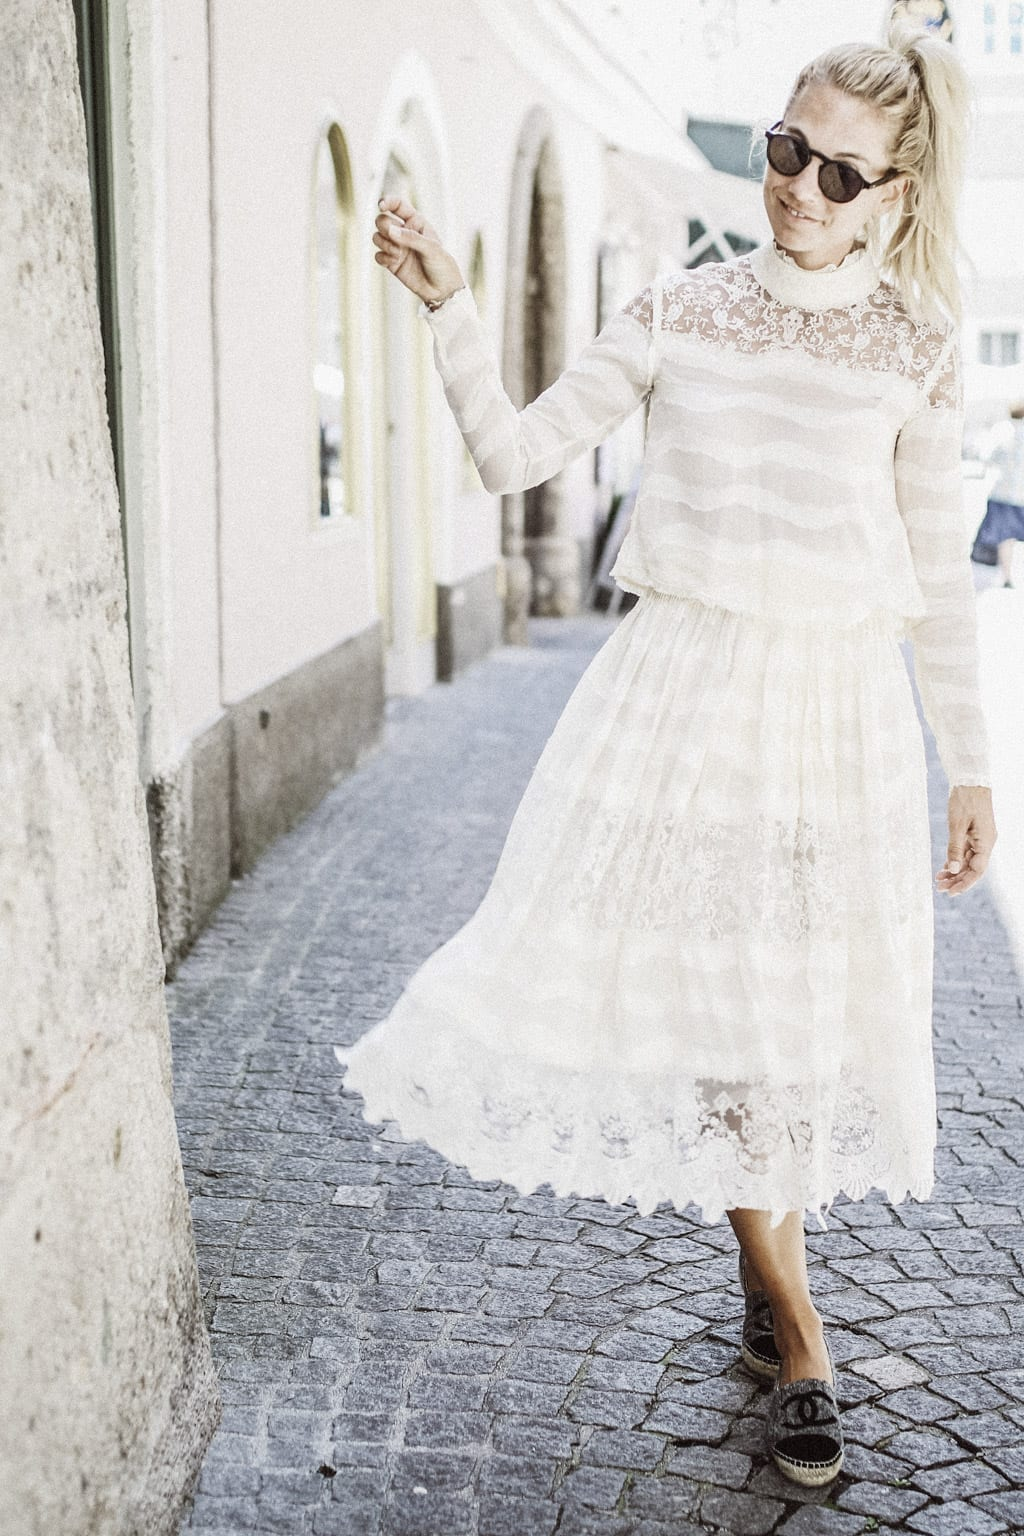 CK-1606-salzburg-austria-fashion-street-style-summer-spring-blog-karin-kaswurm-hm-kleid-2883